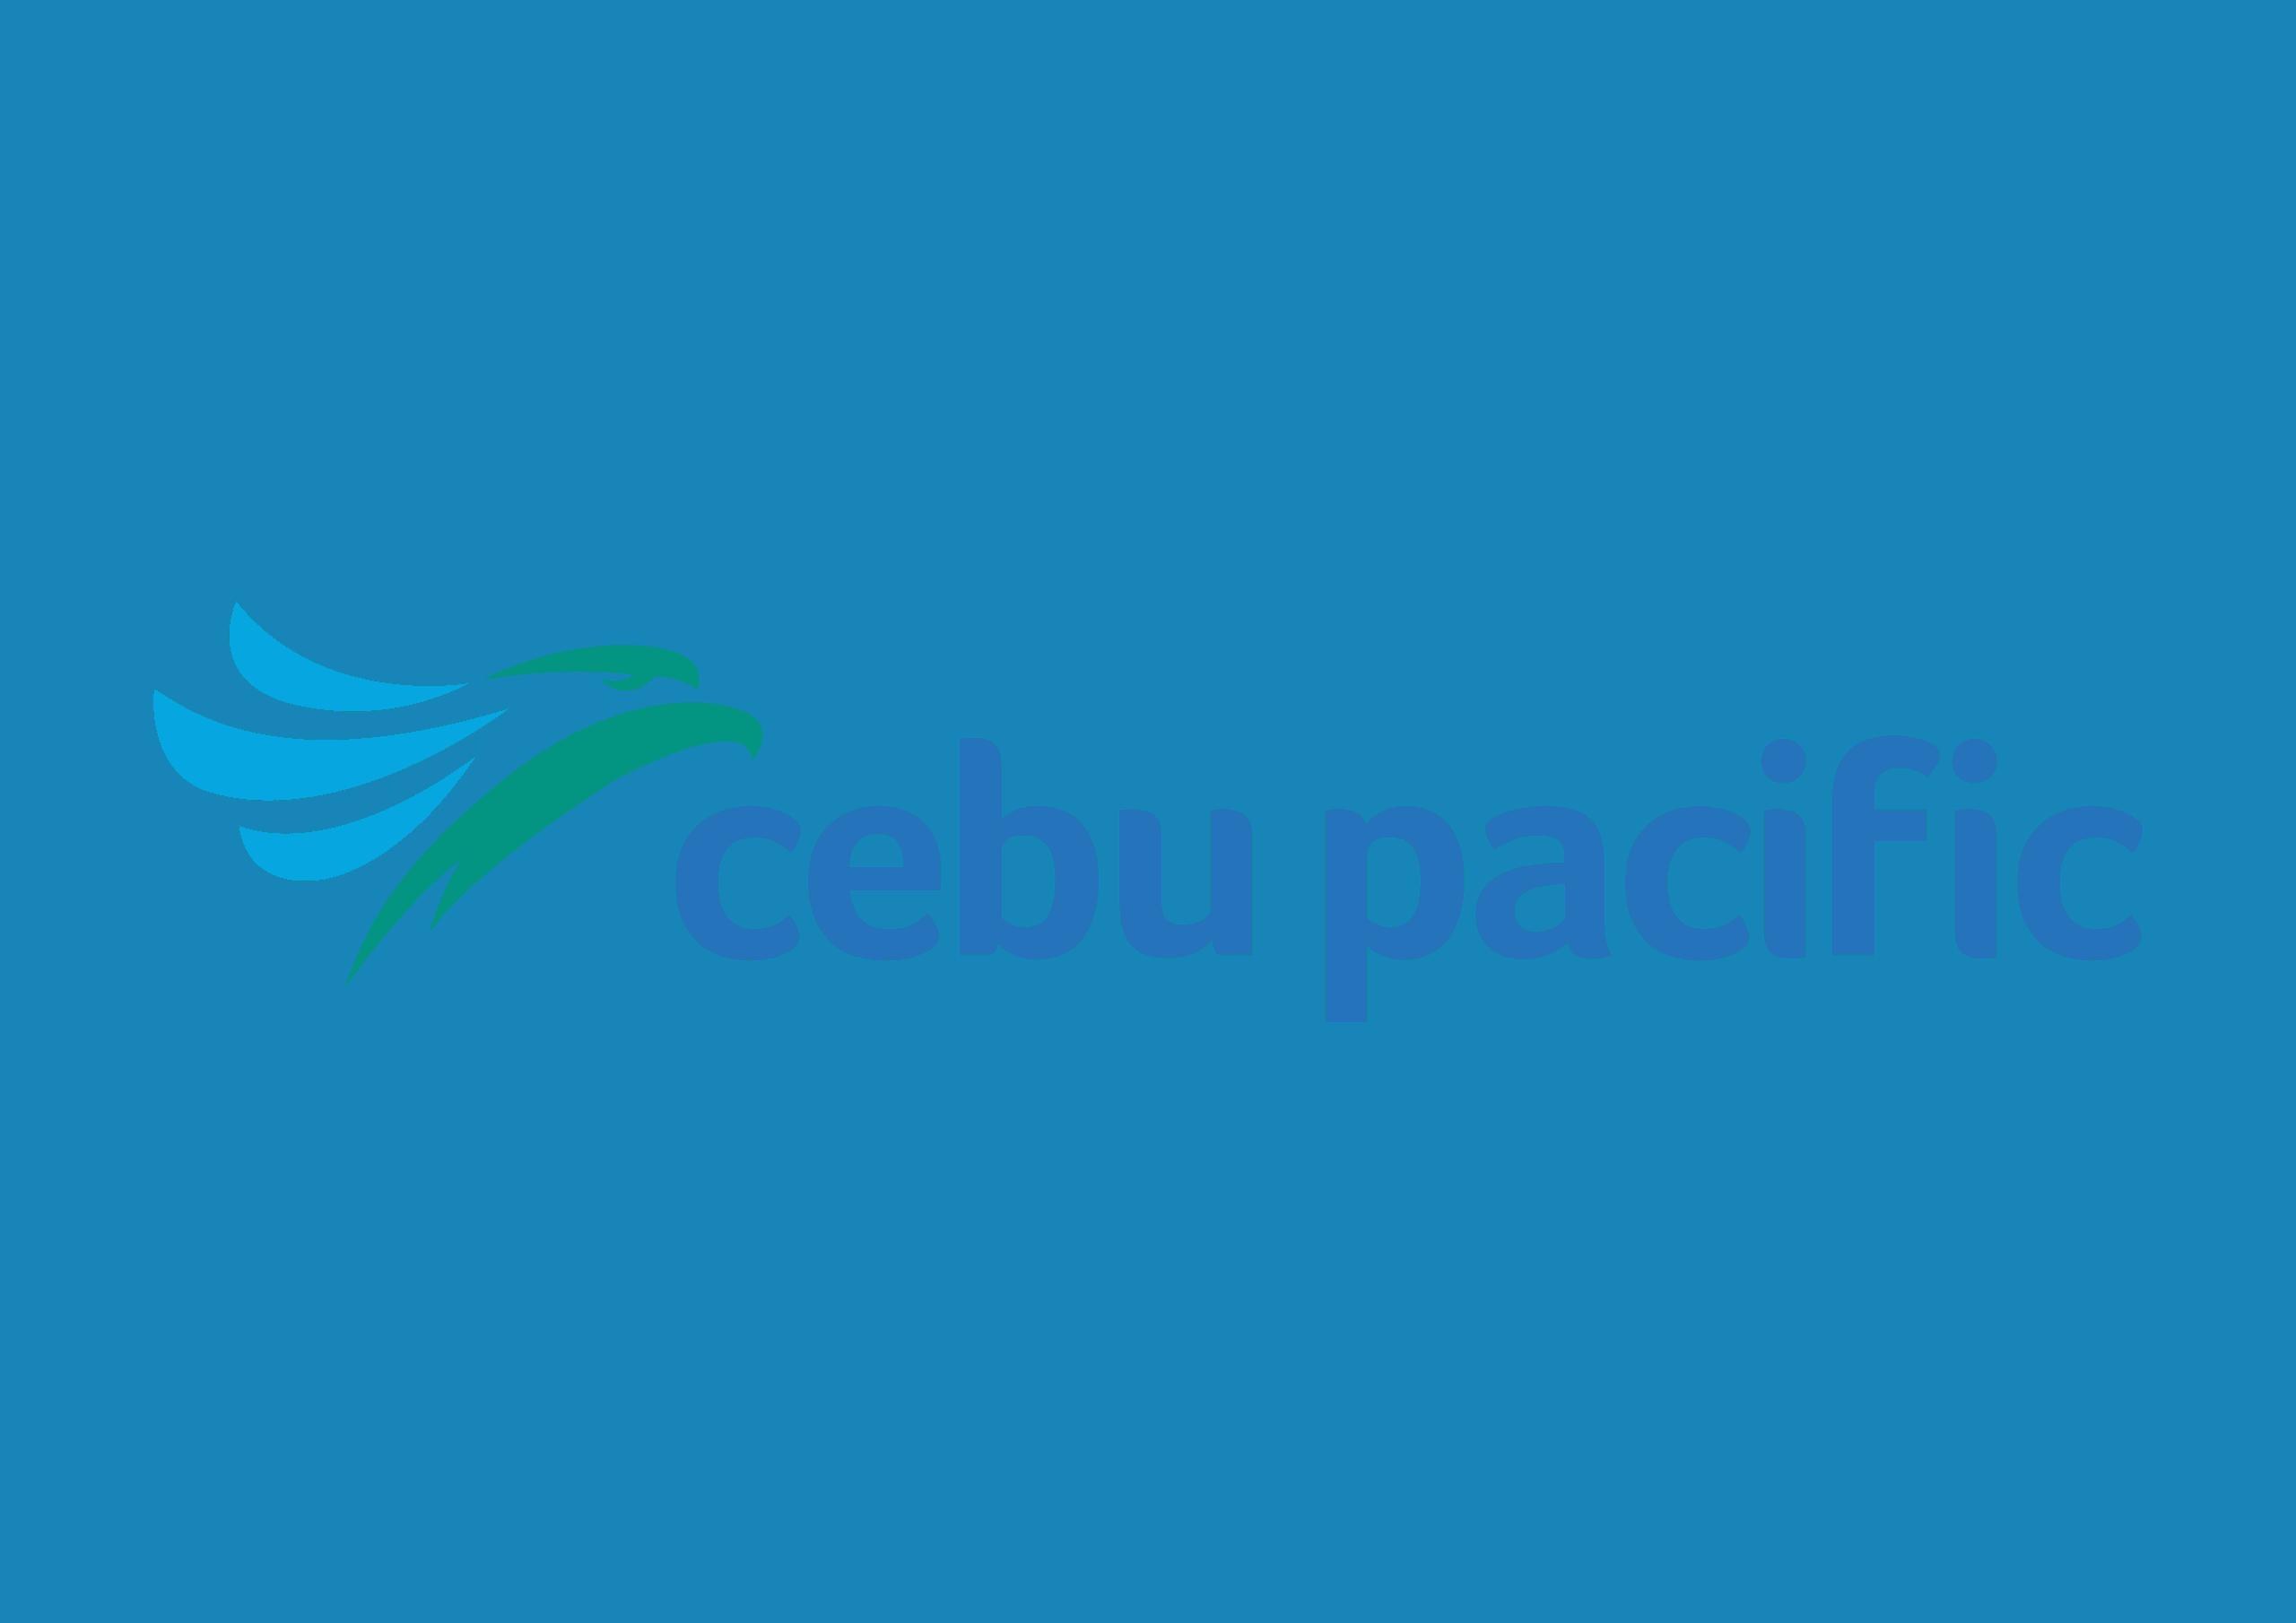 Cebu Pacific Air Color